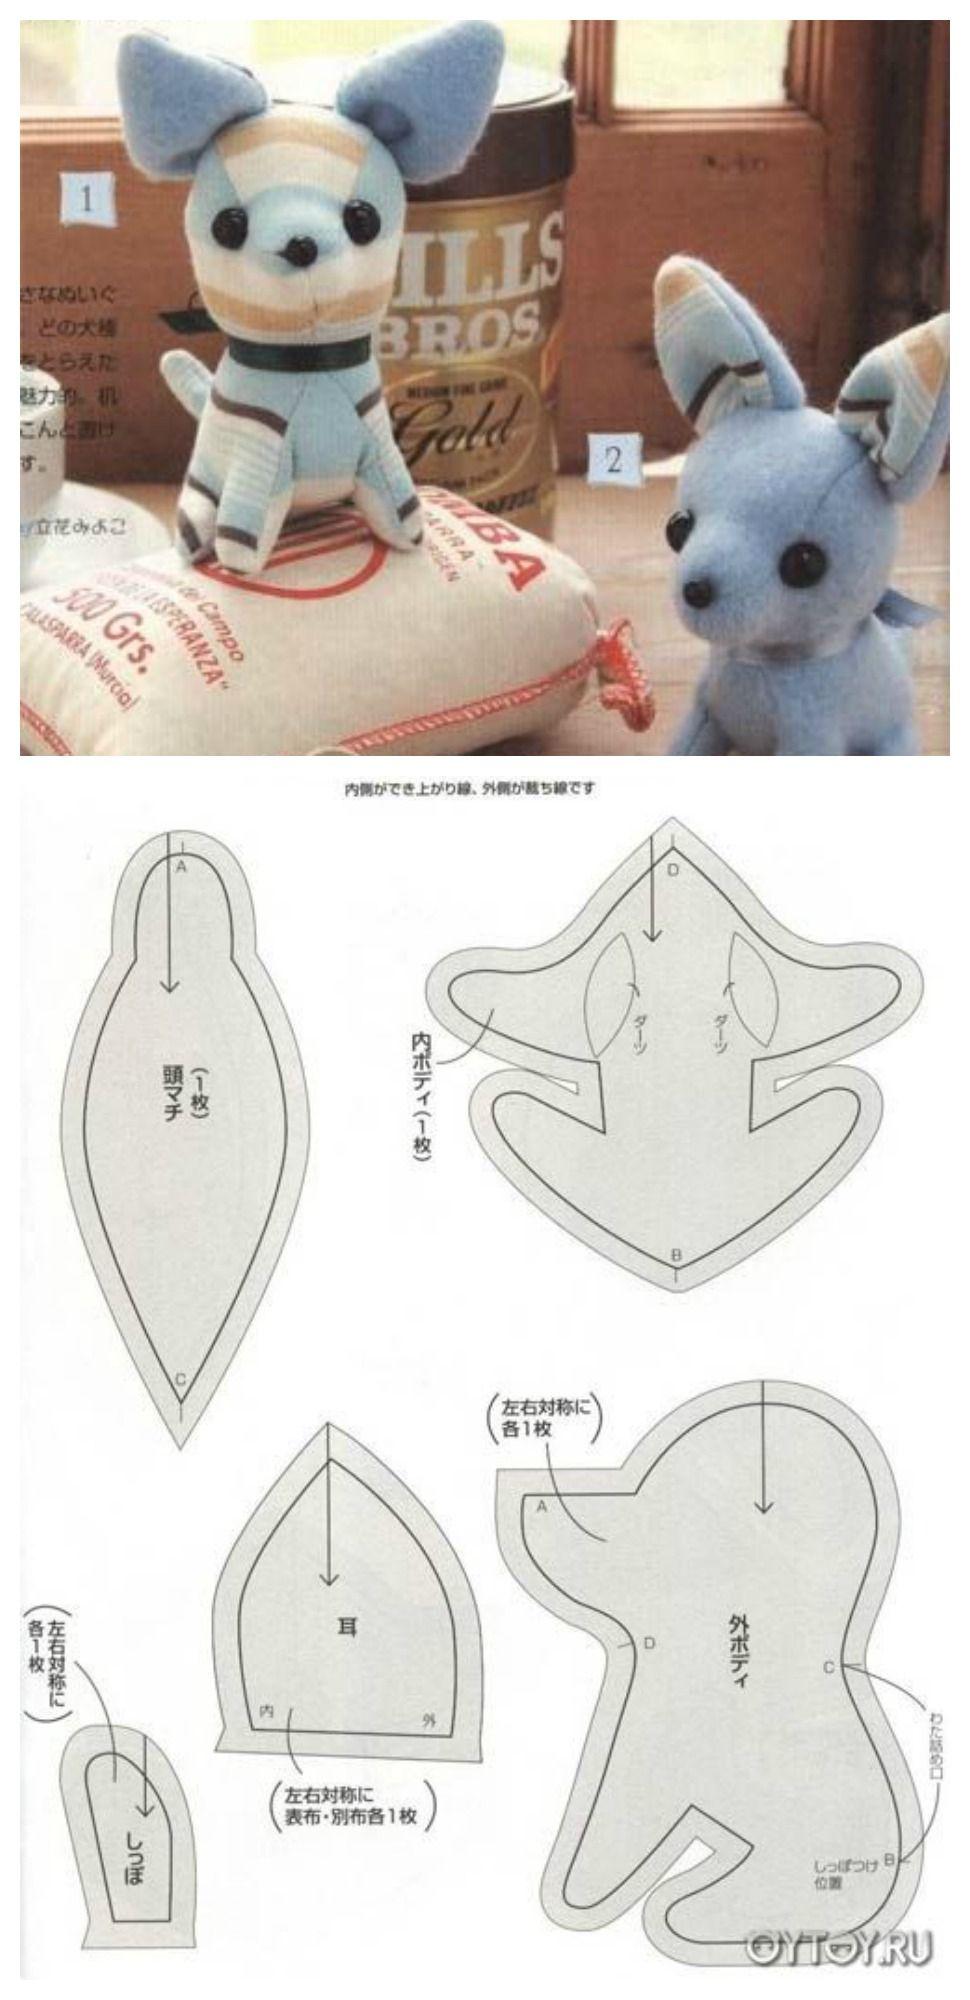 Chihuahua Pattern | Muñecos de tela. | Pinterest | Muñecas, Patrones ...